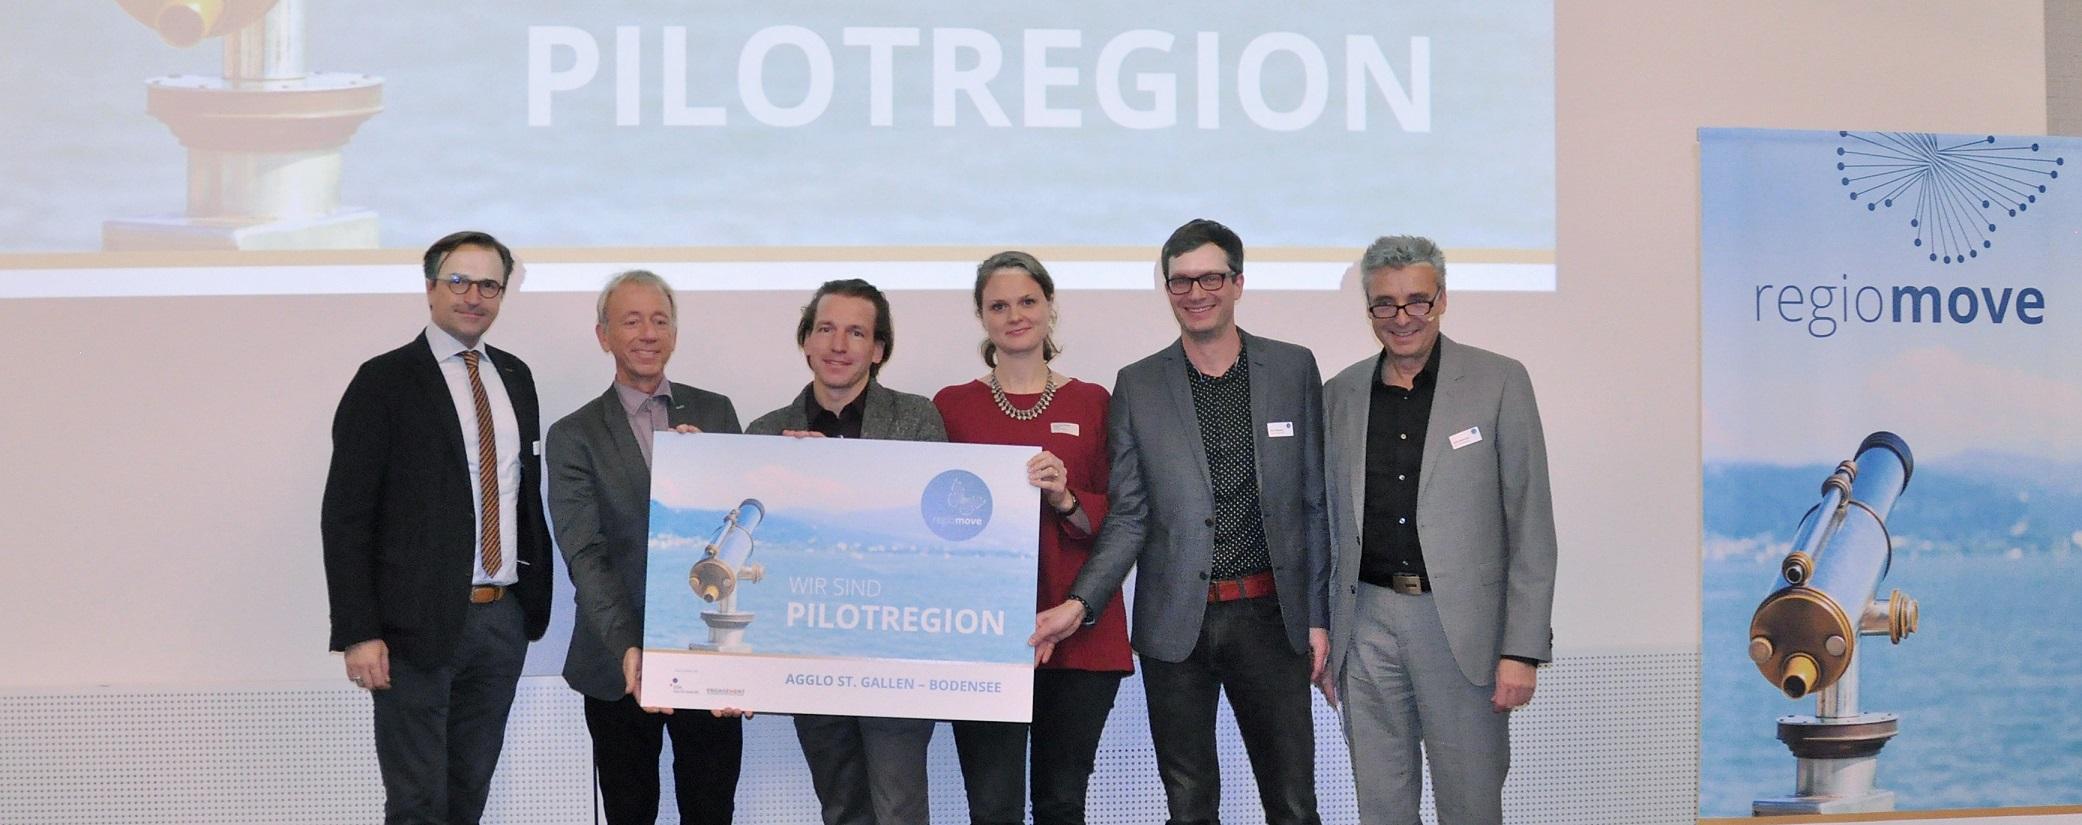 v.l.n.r.: David H. Bon (Stadtpräsident Romanshorn), Martin Wälti (bfm), Rolf Geiger (Agglo St.Gallen-Bodensee), Alexandra Müller-Crepon (Engagement Migros), Uwe Schlosser (bfm), Peter Masciadri (Tagungsmoderation)